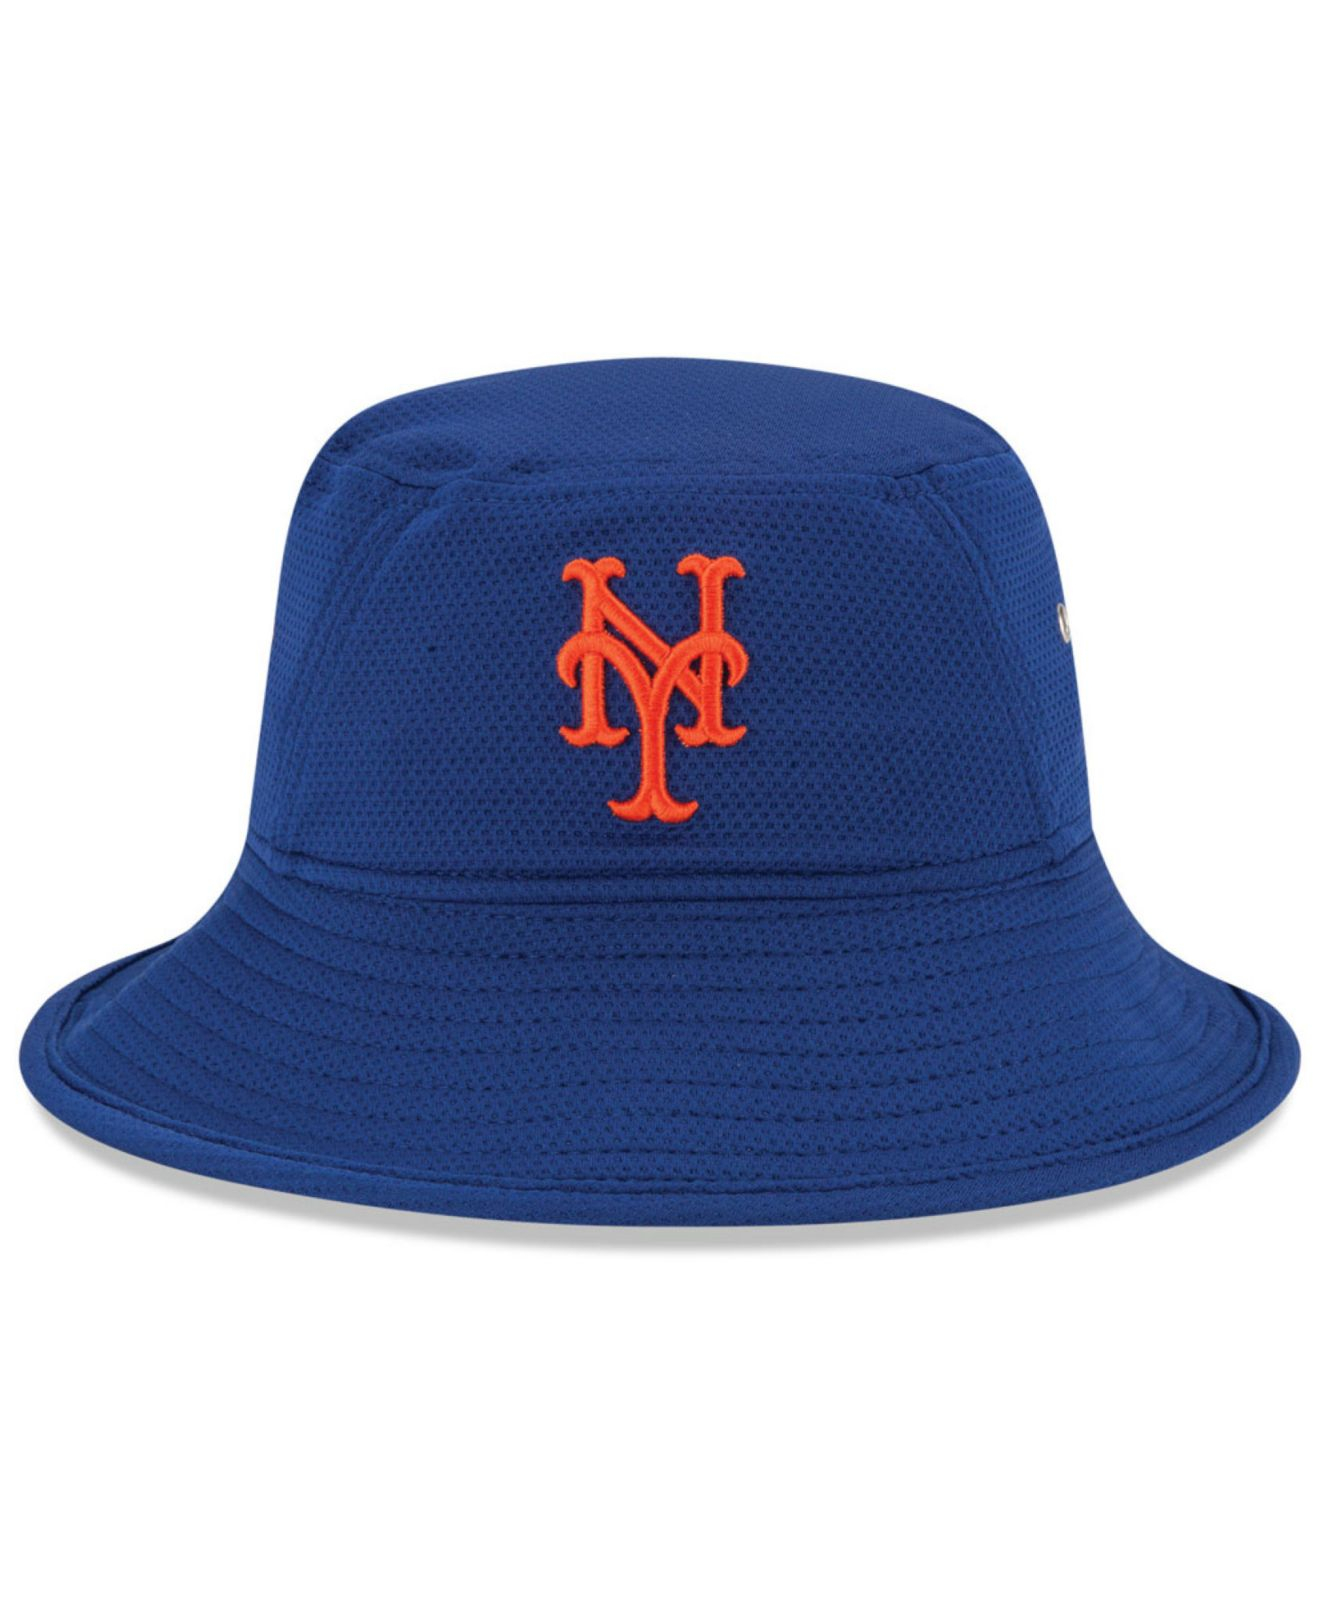 Lyst - KTZ New York Mets Redux Bucket Hat in Blue ca313ebd95f